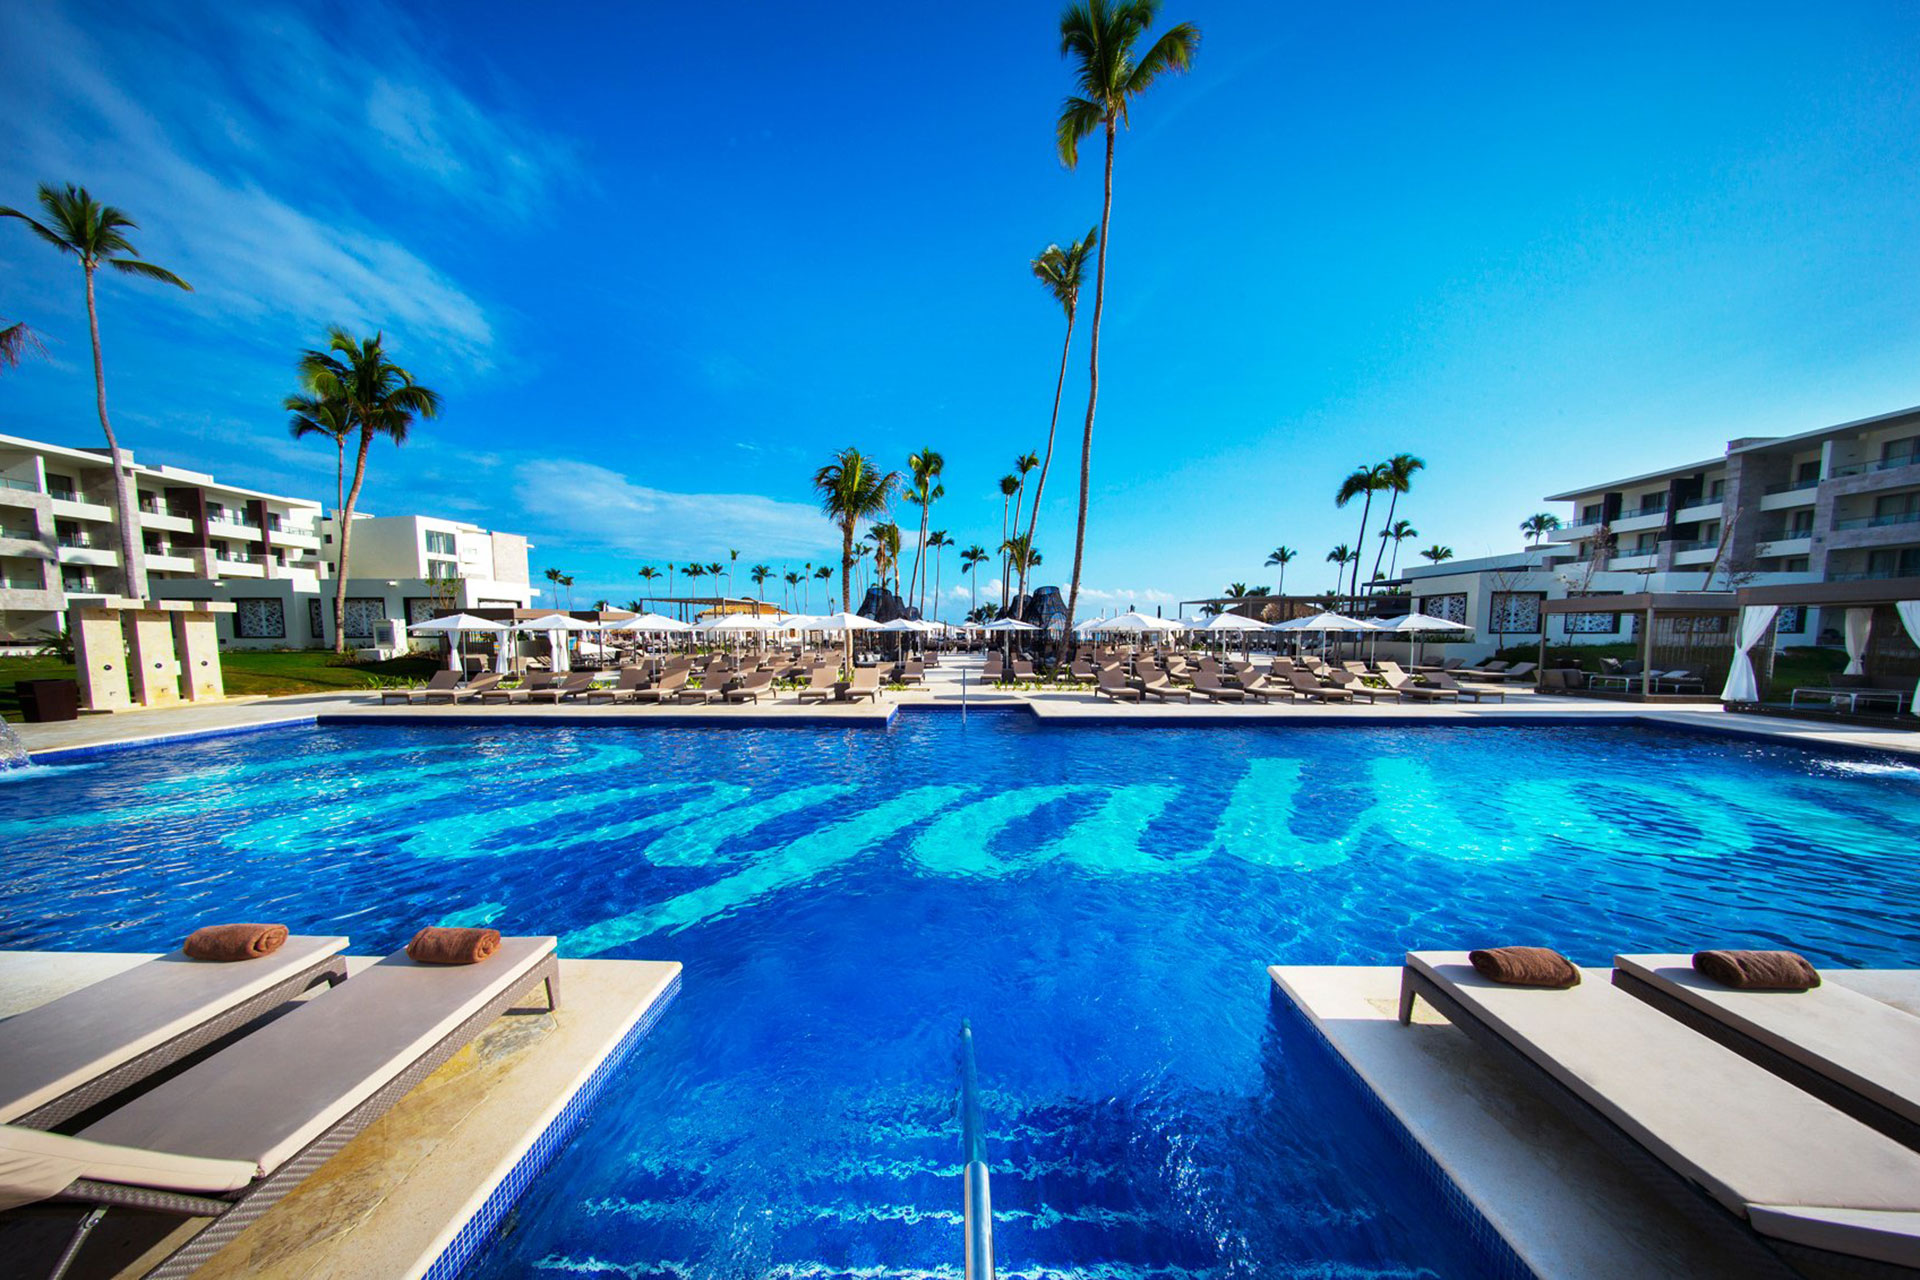 Pool at Royalton Bavaro Resort & Spa in Punta Cana, Dominican Republic